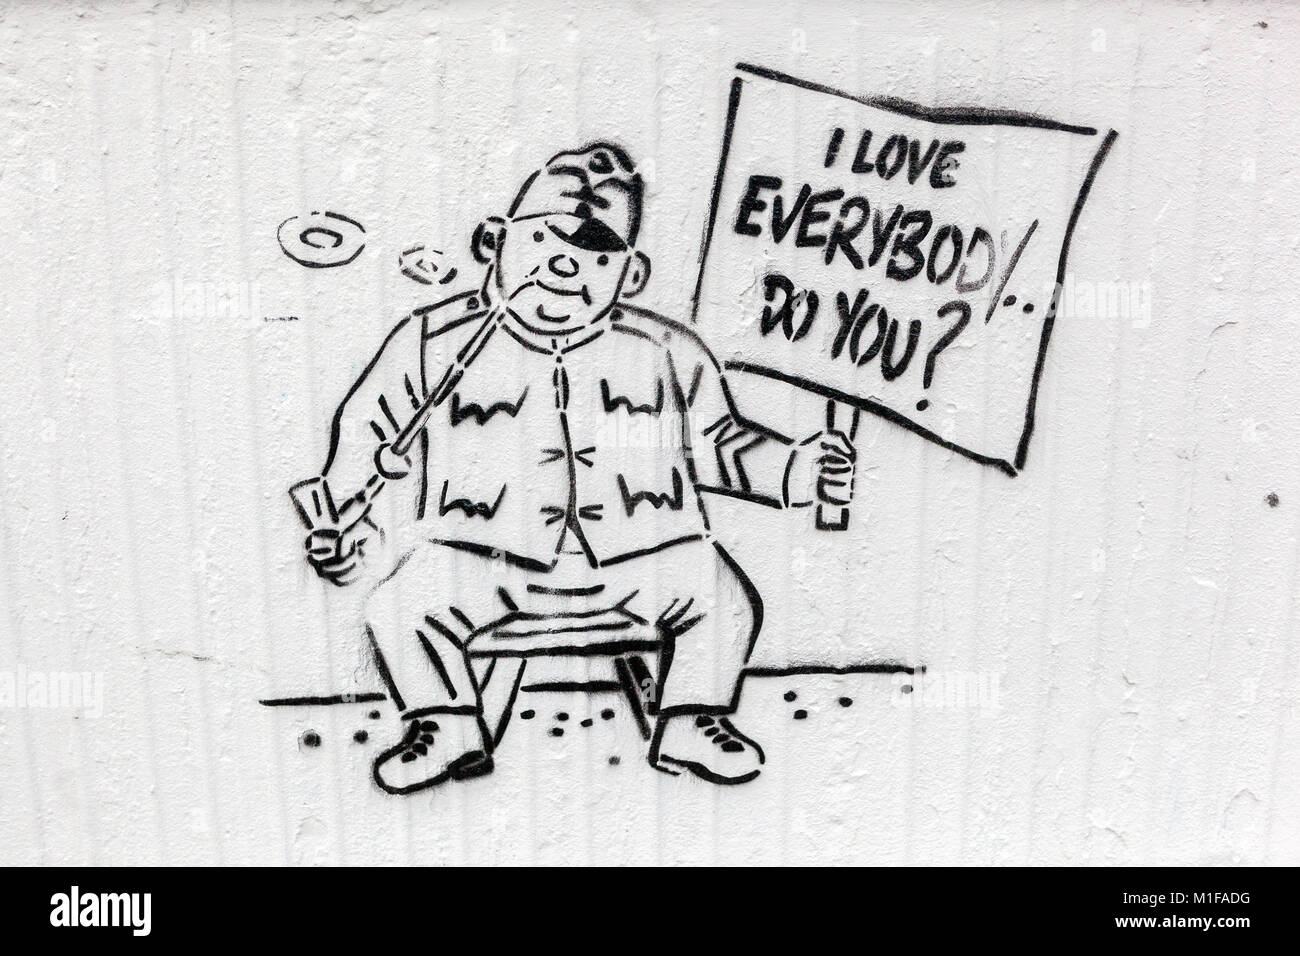 Good Soldier Svejk, literary figure, graffity, Czech Republic - Stock Image